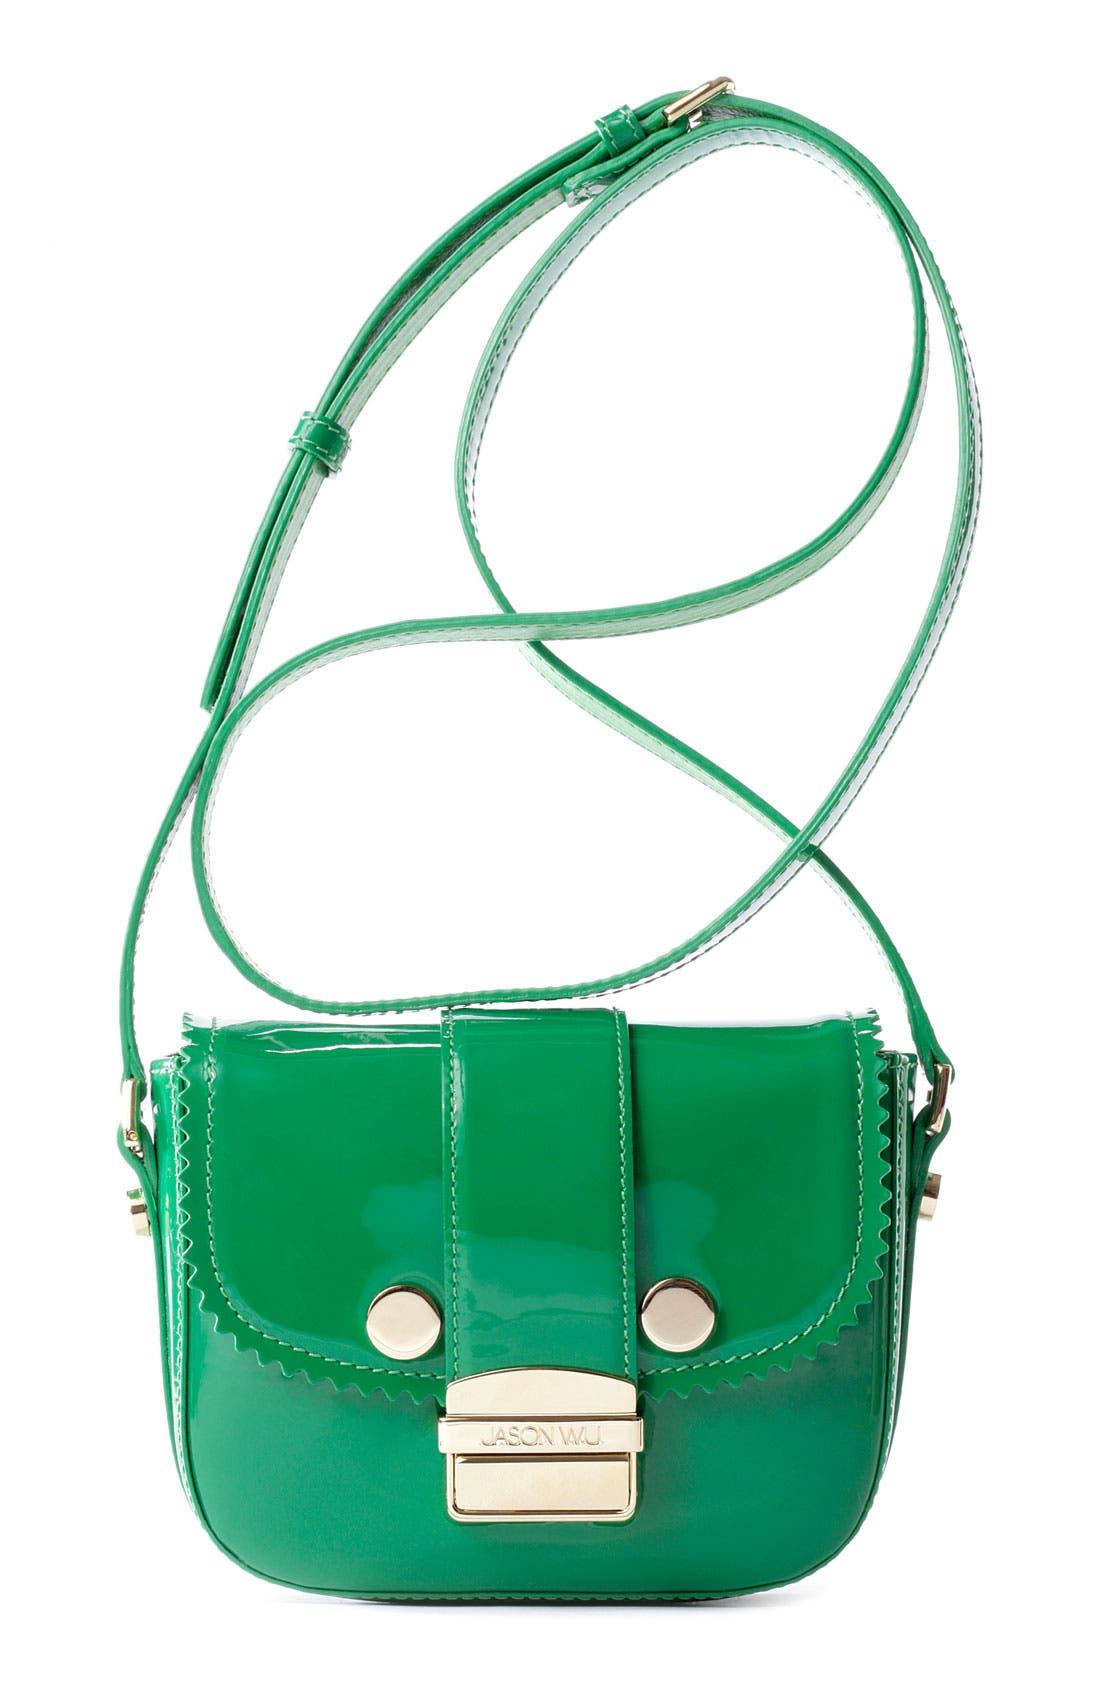 Alternate Image 1 Selected - Jason Wu 'Mini Miss Wu' Patent Leather Crossbody Bag